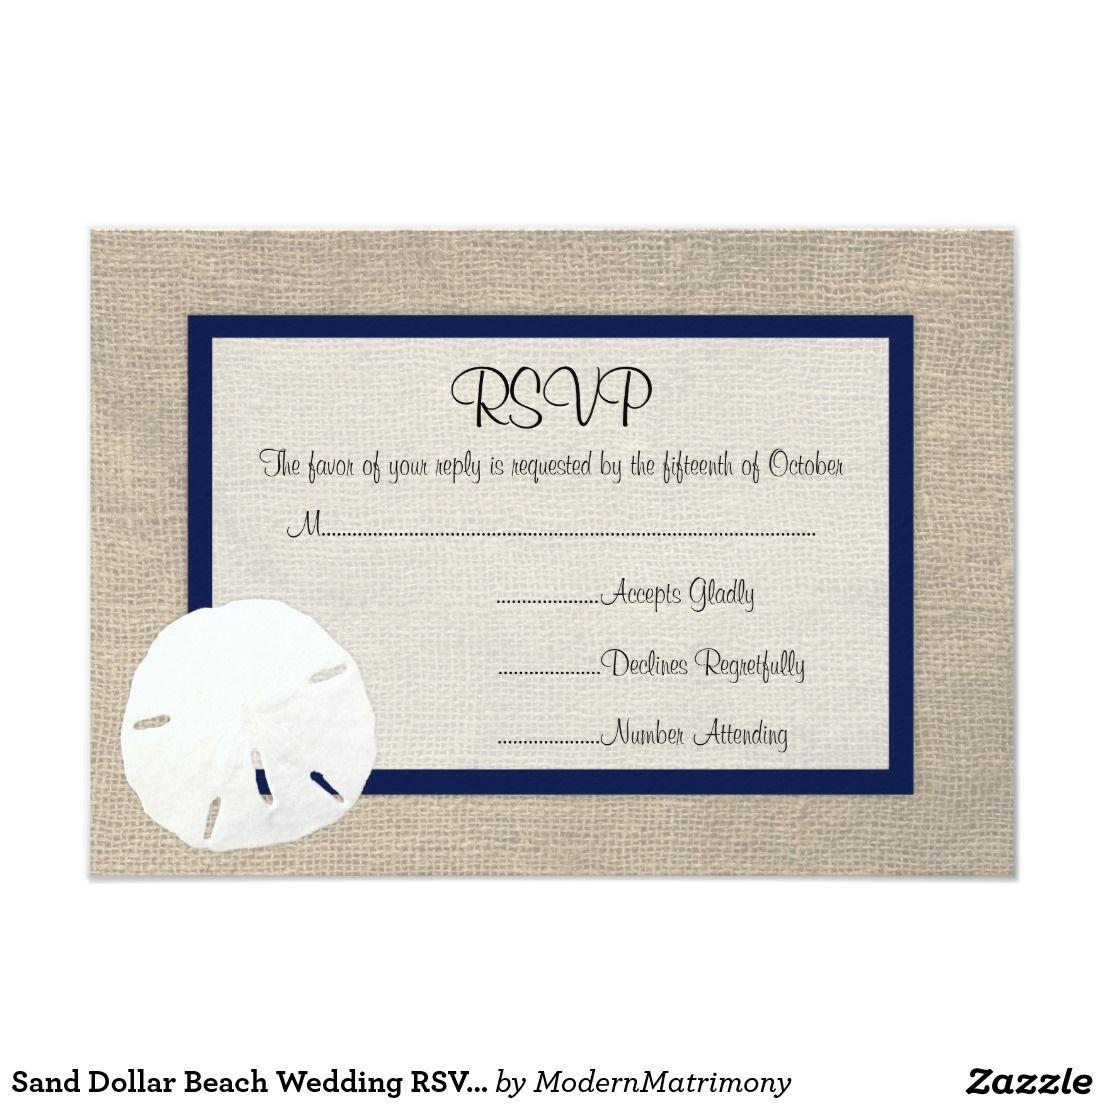 Sand Dollar Beach Wedding RSVP card - Navy Blue | Beach Wedding ...